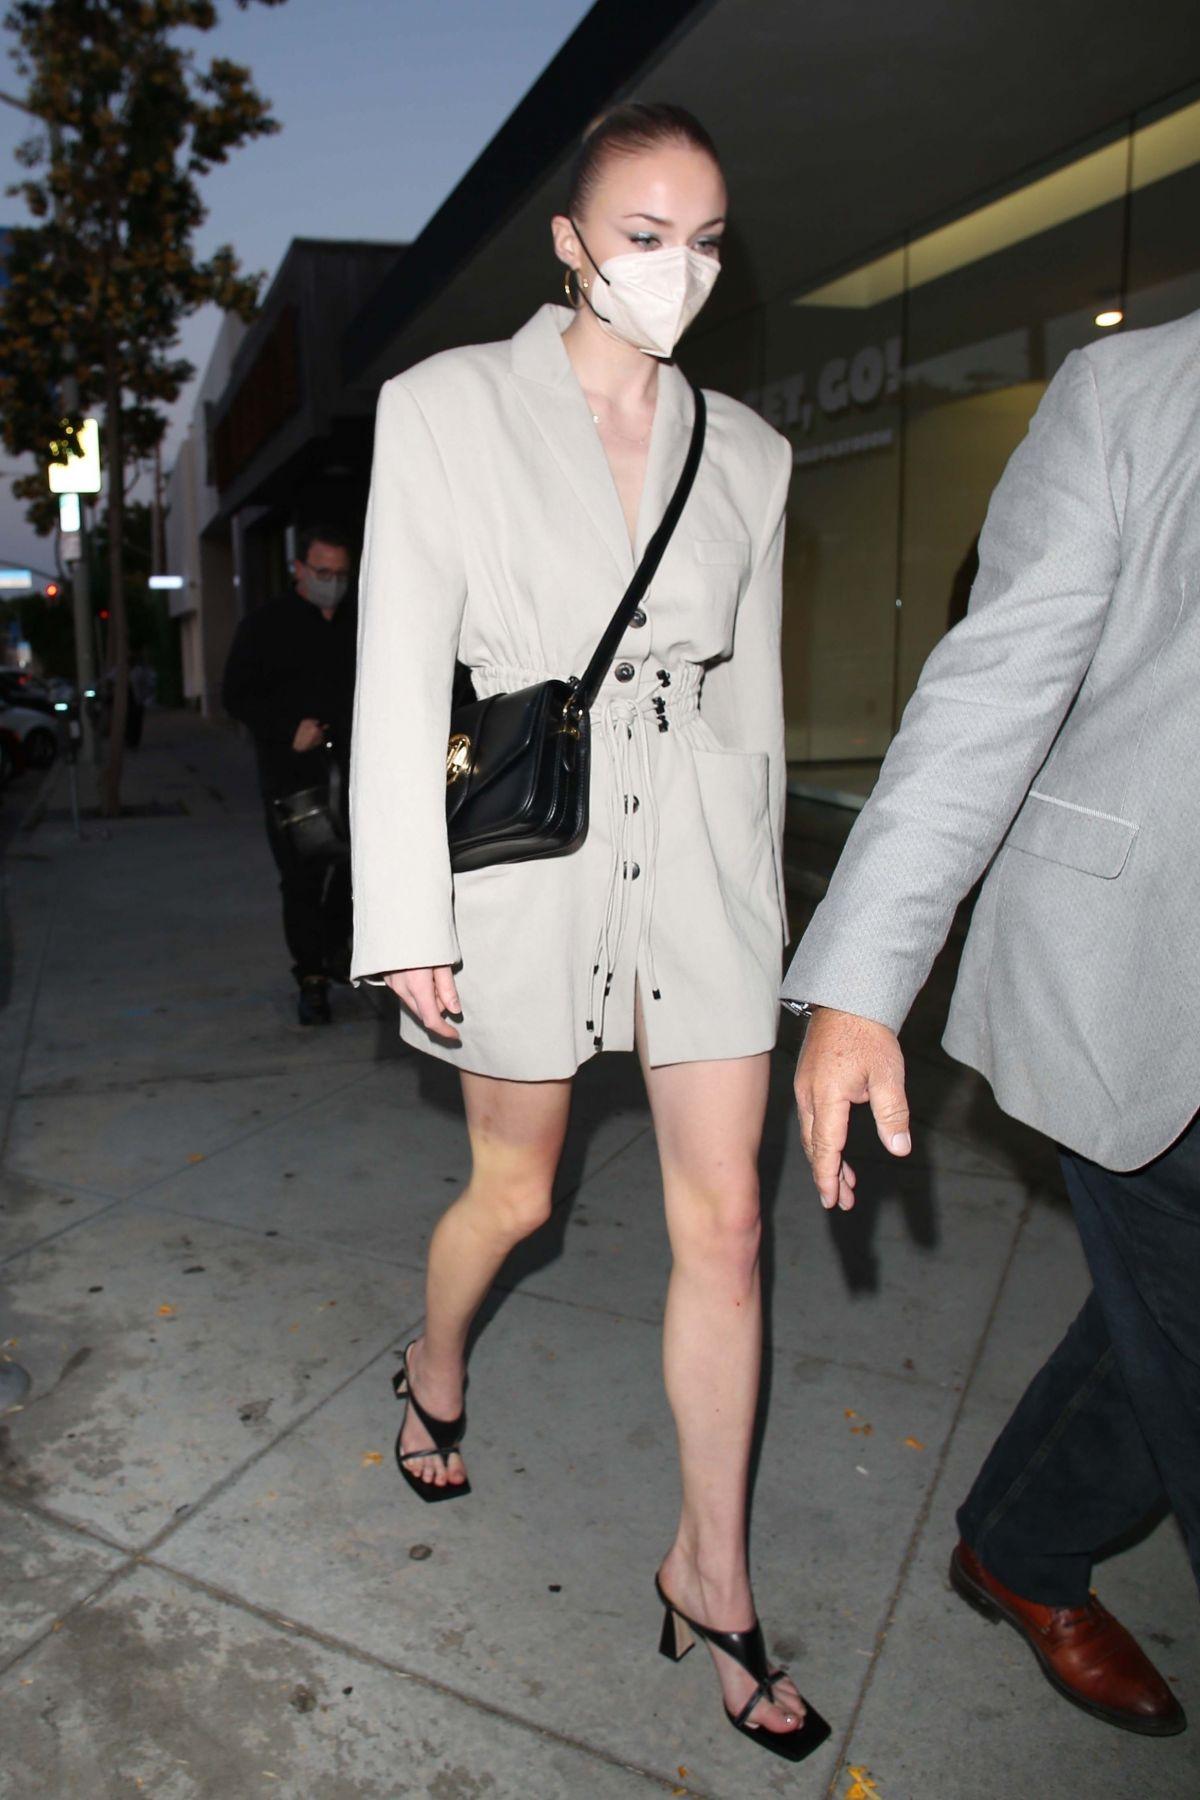 sophie-turner-weariing-the-mannei-irbid-dress-west-hollywood-may-7-2021